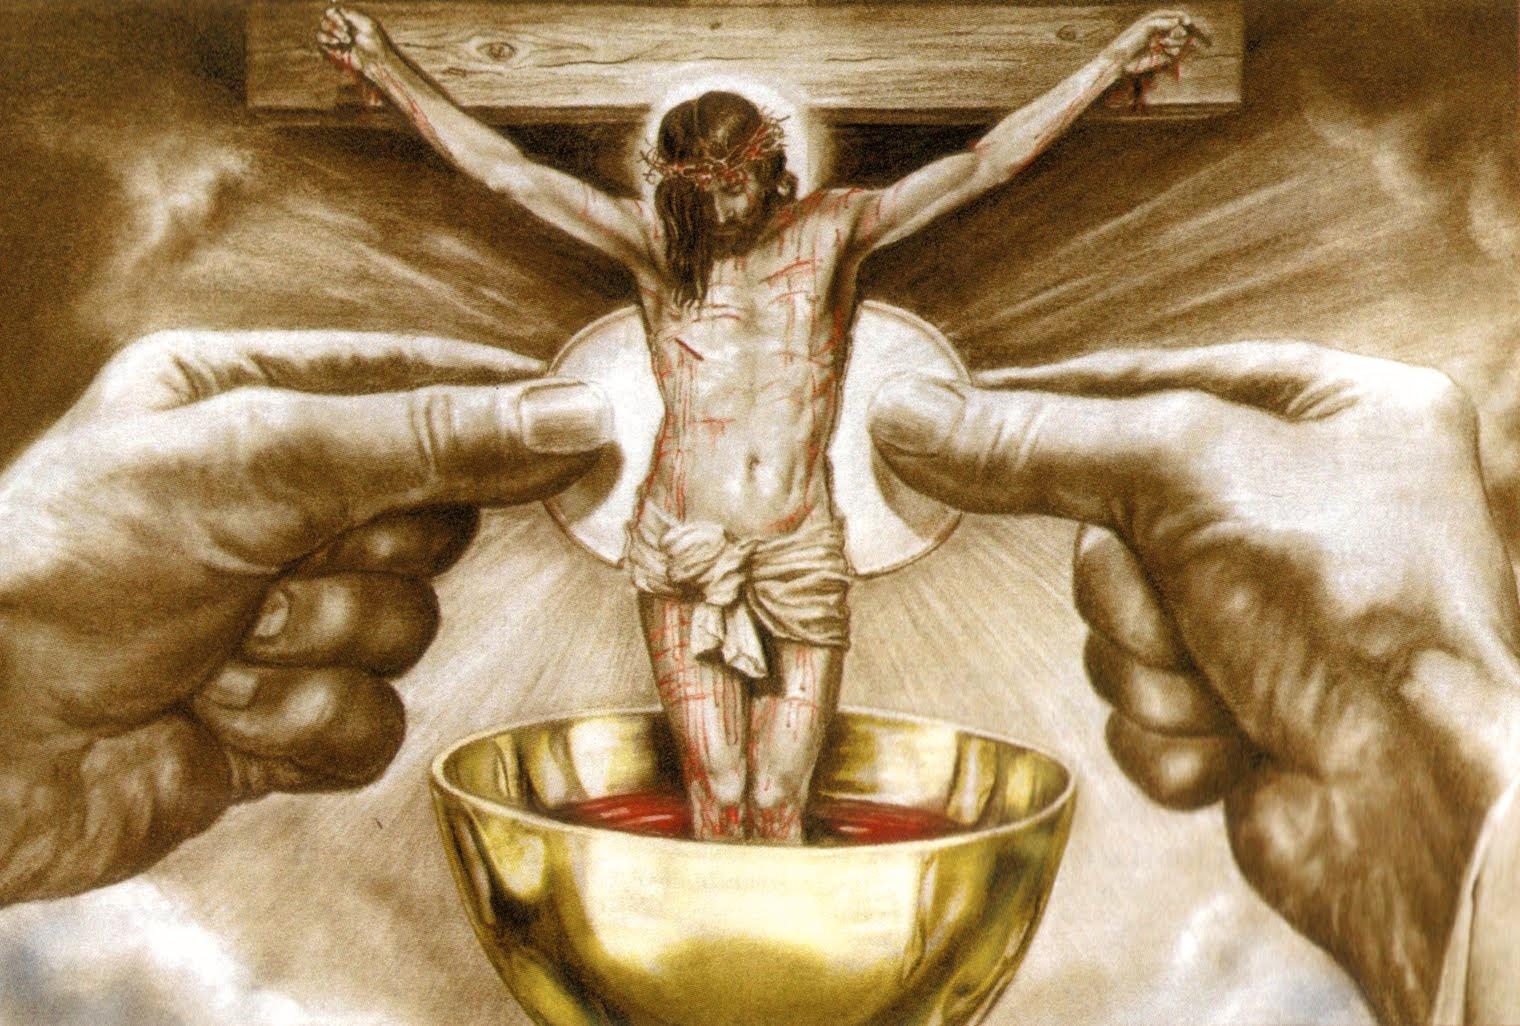 jesus-presence-in-the-eucharist (1)